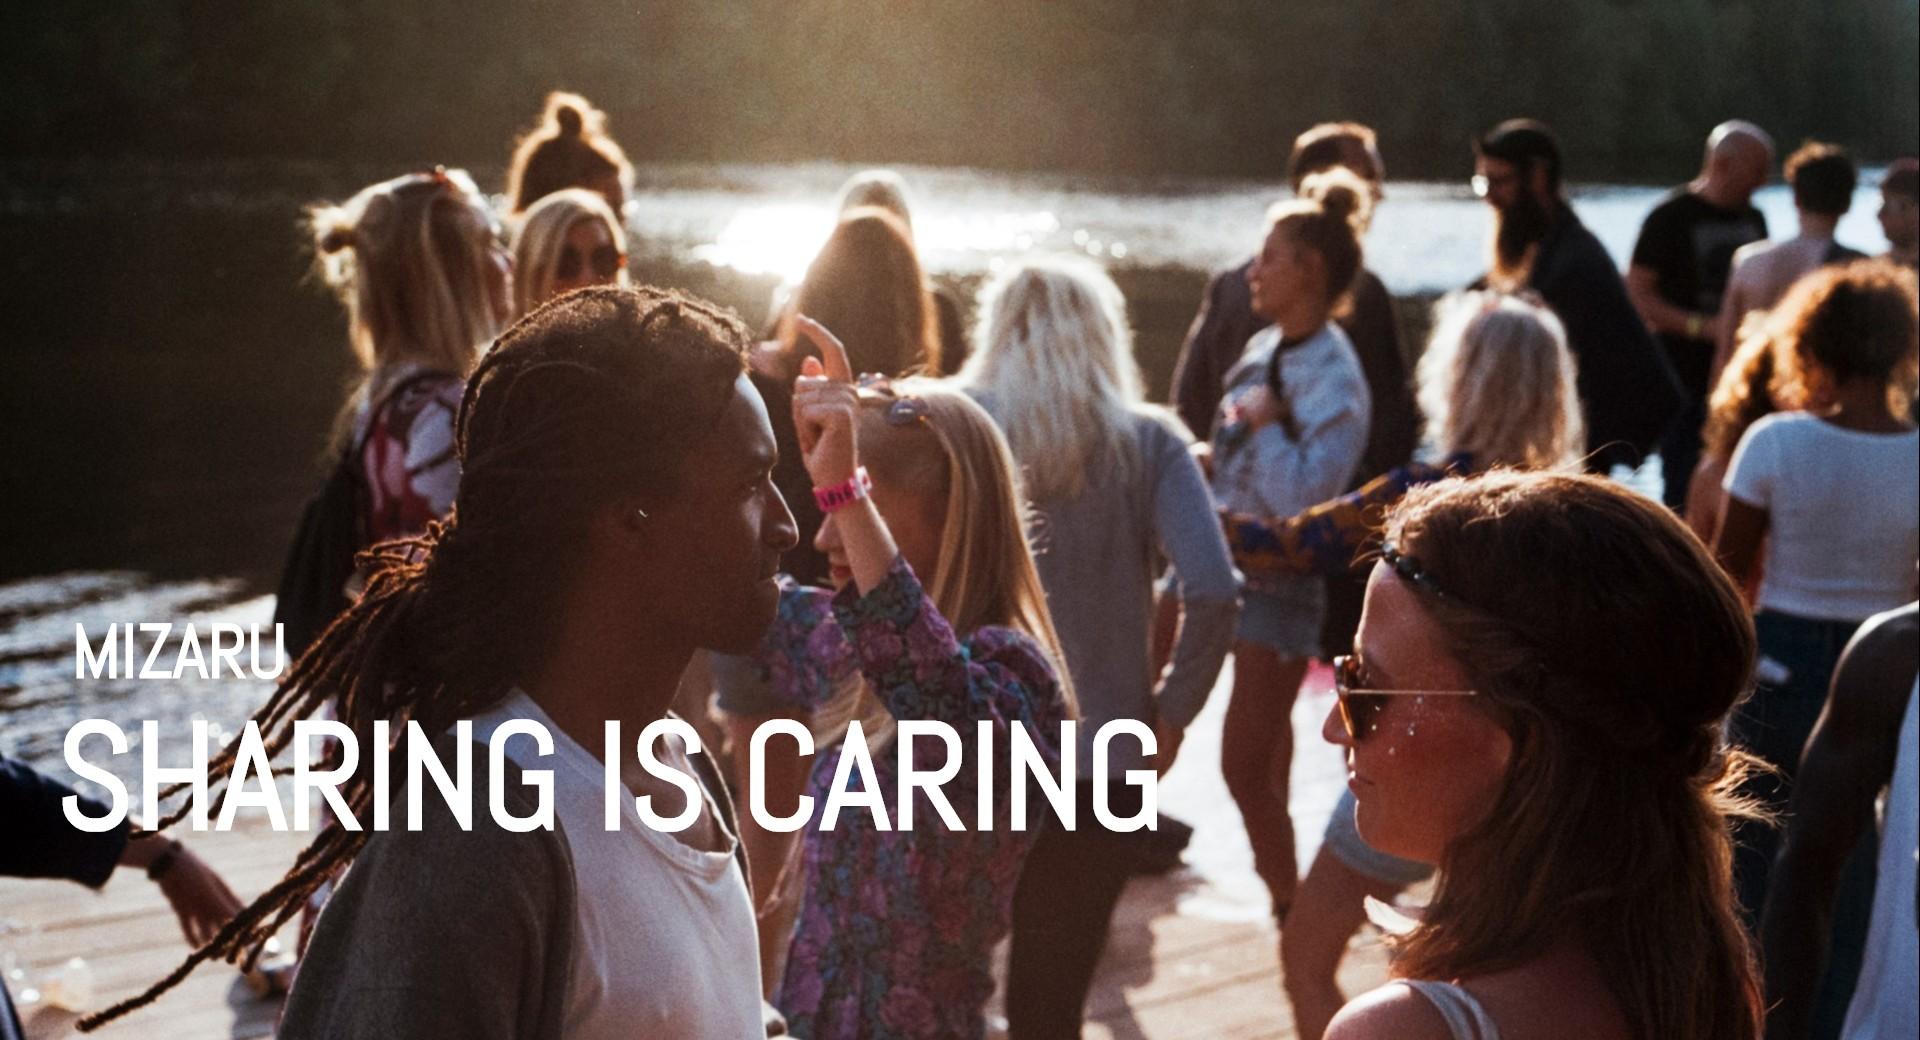 mizaru-banner-miza-diplomat-sharing-is-caring